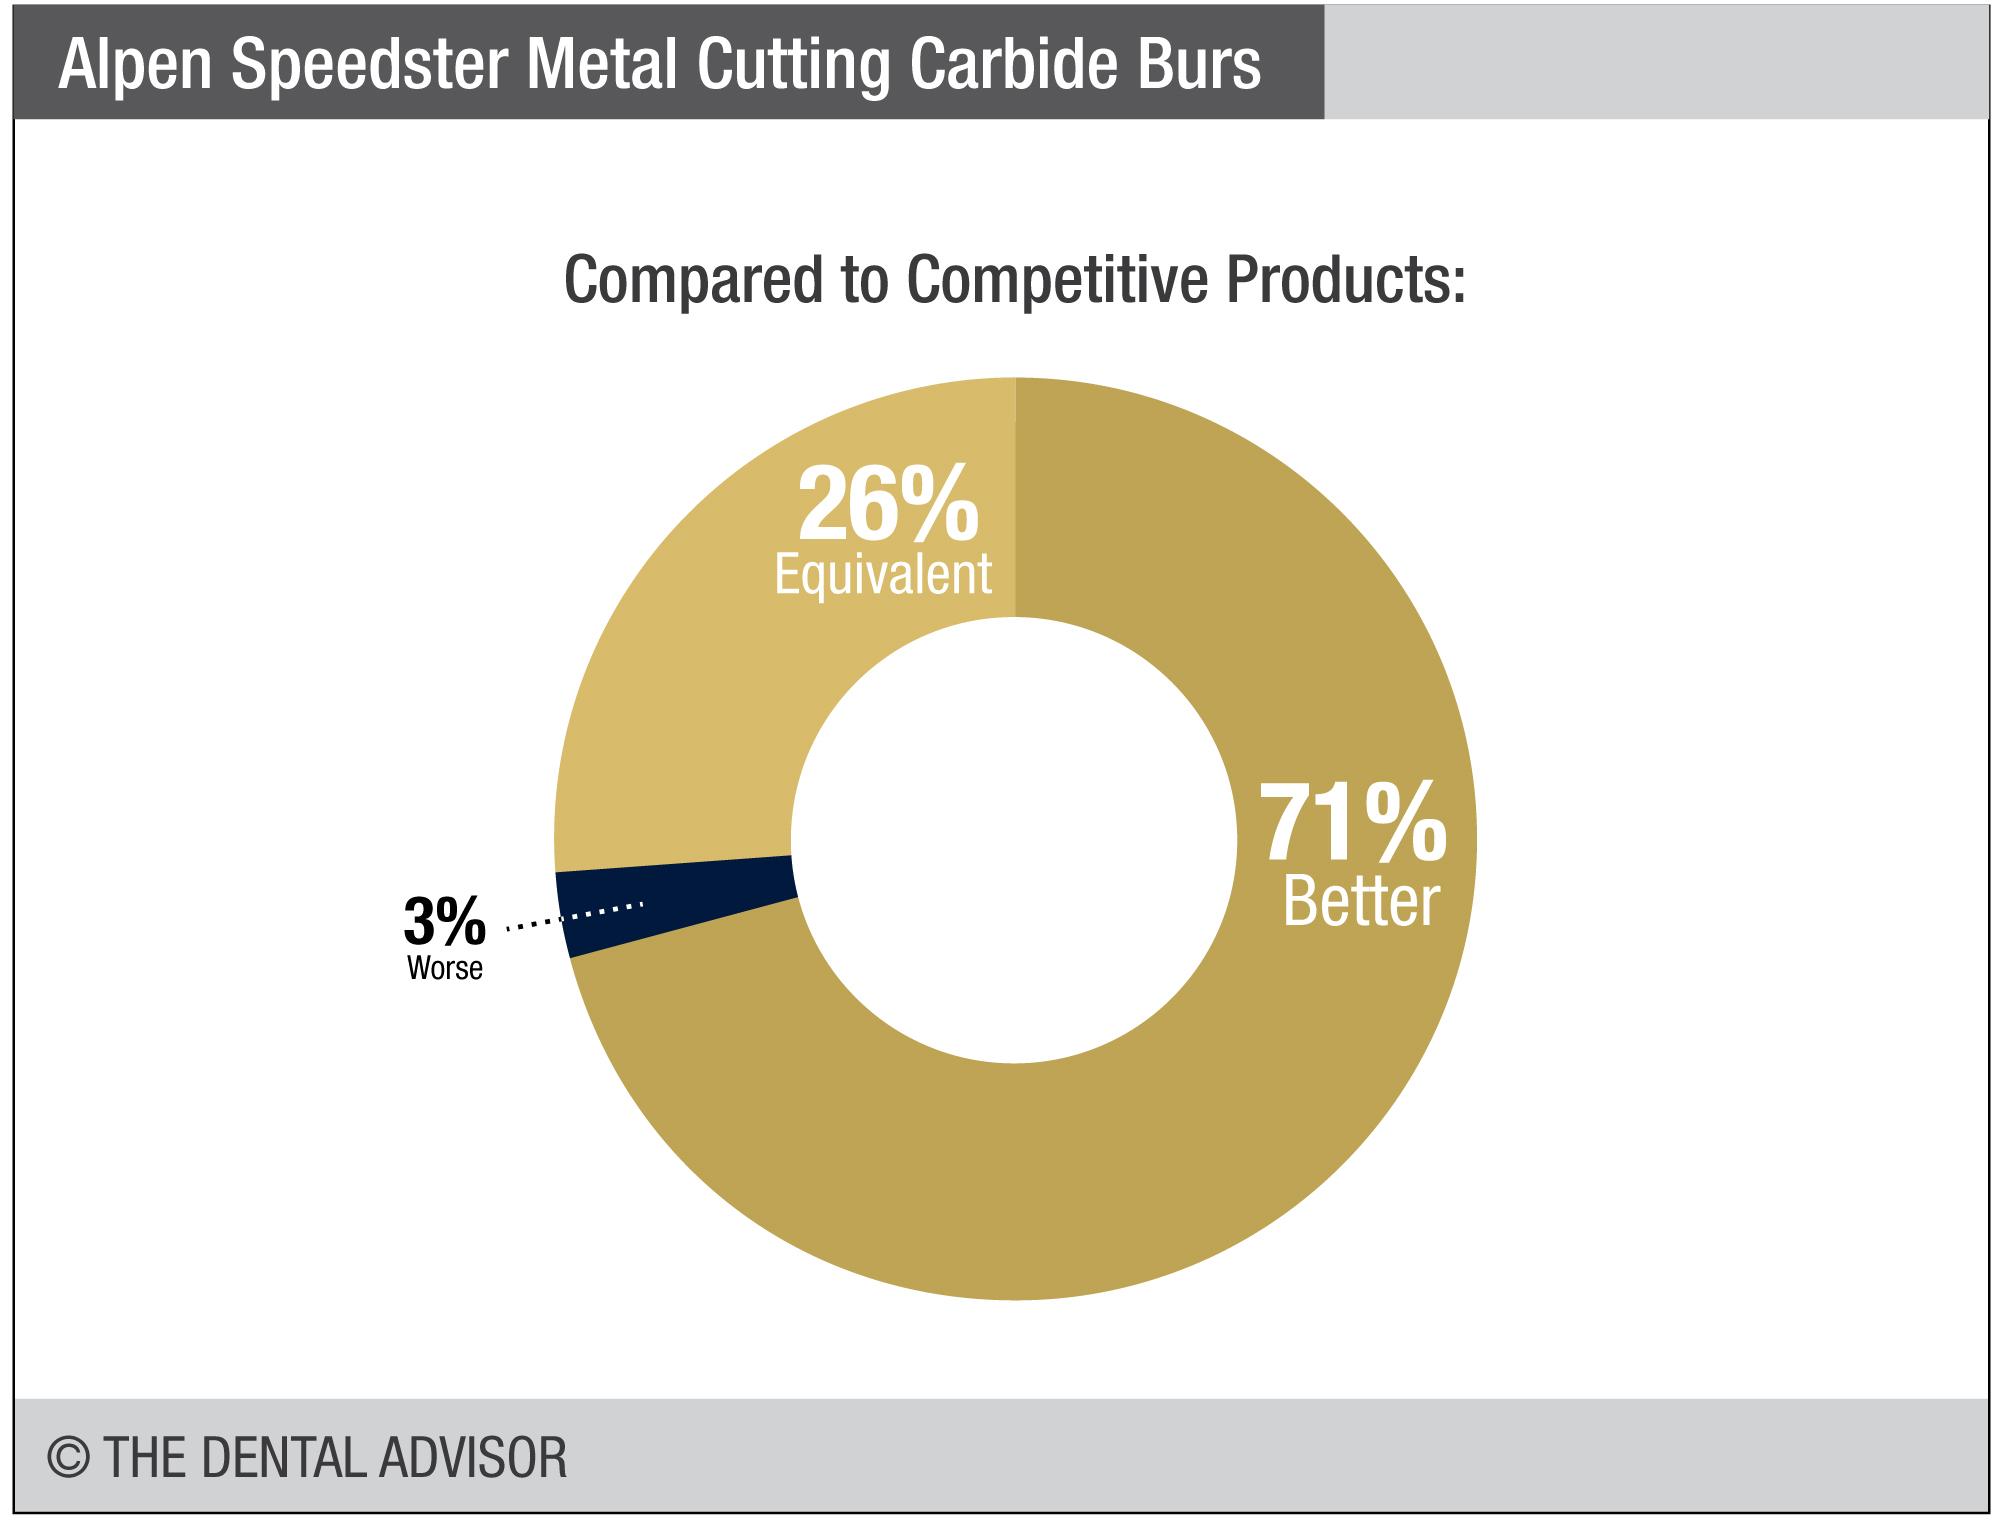 Alpen Speedster Metal Cutting Carbide Burs – The Dental Advisor